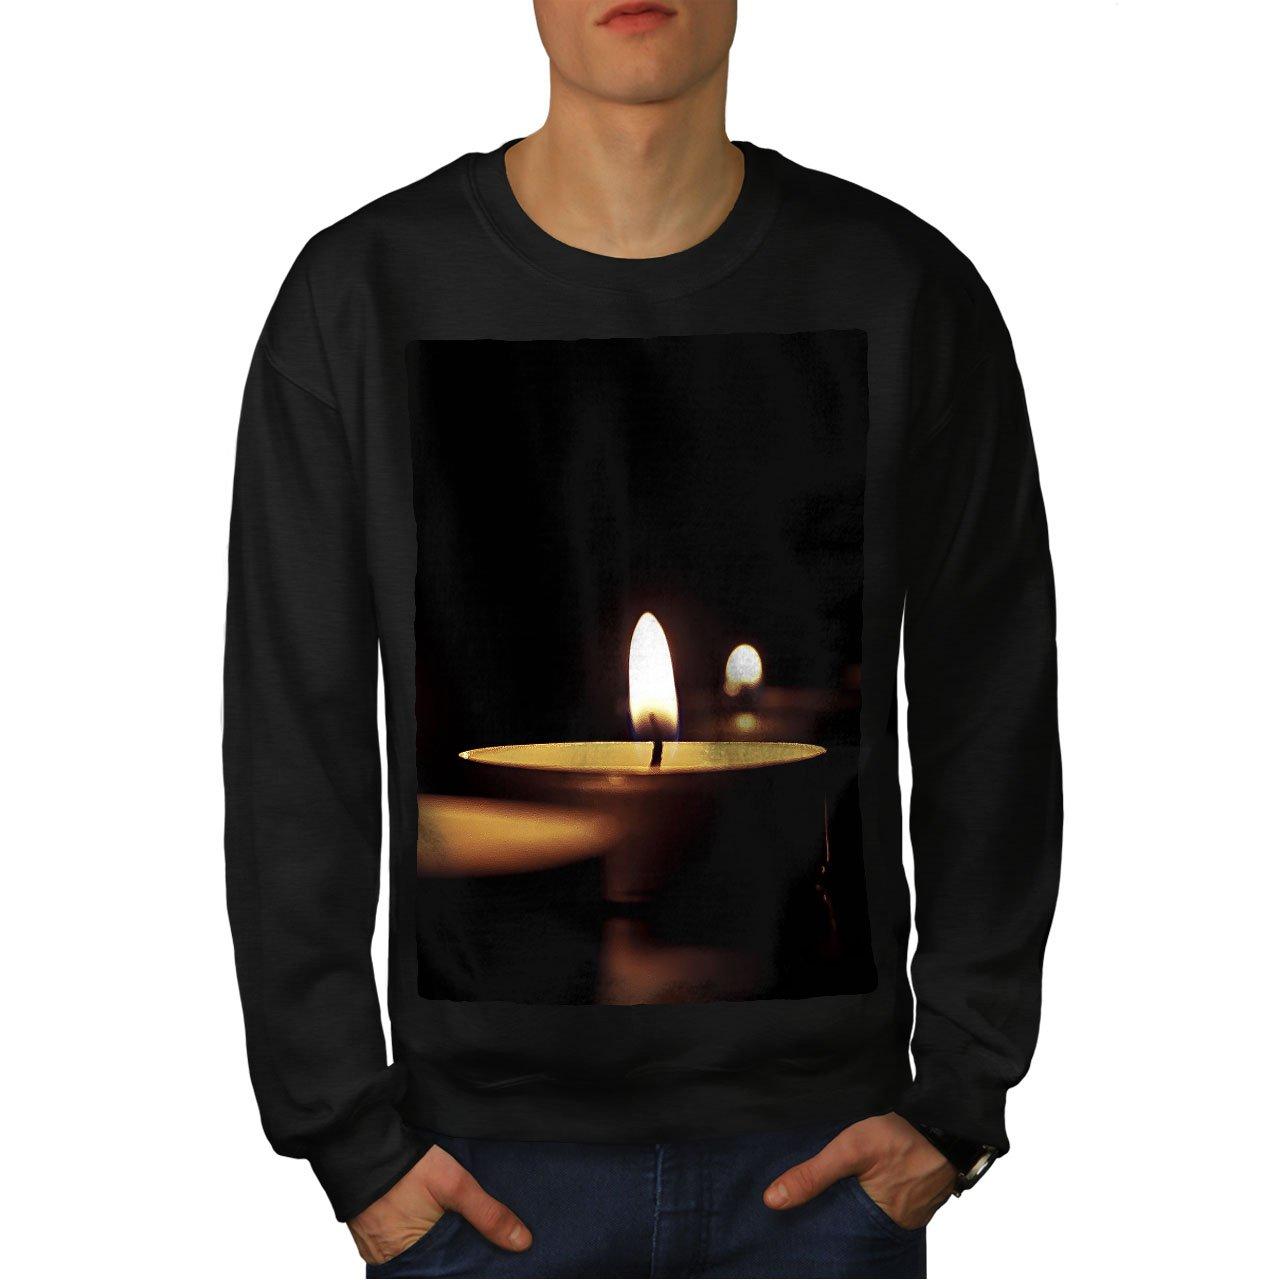 wellcoda Meditation Candle Nature Mens Sweatshirt Warm Casual Jumper